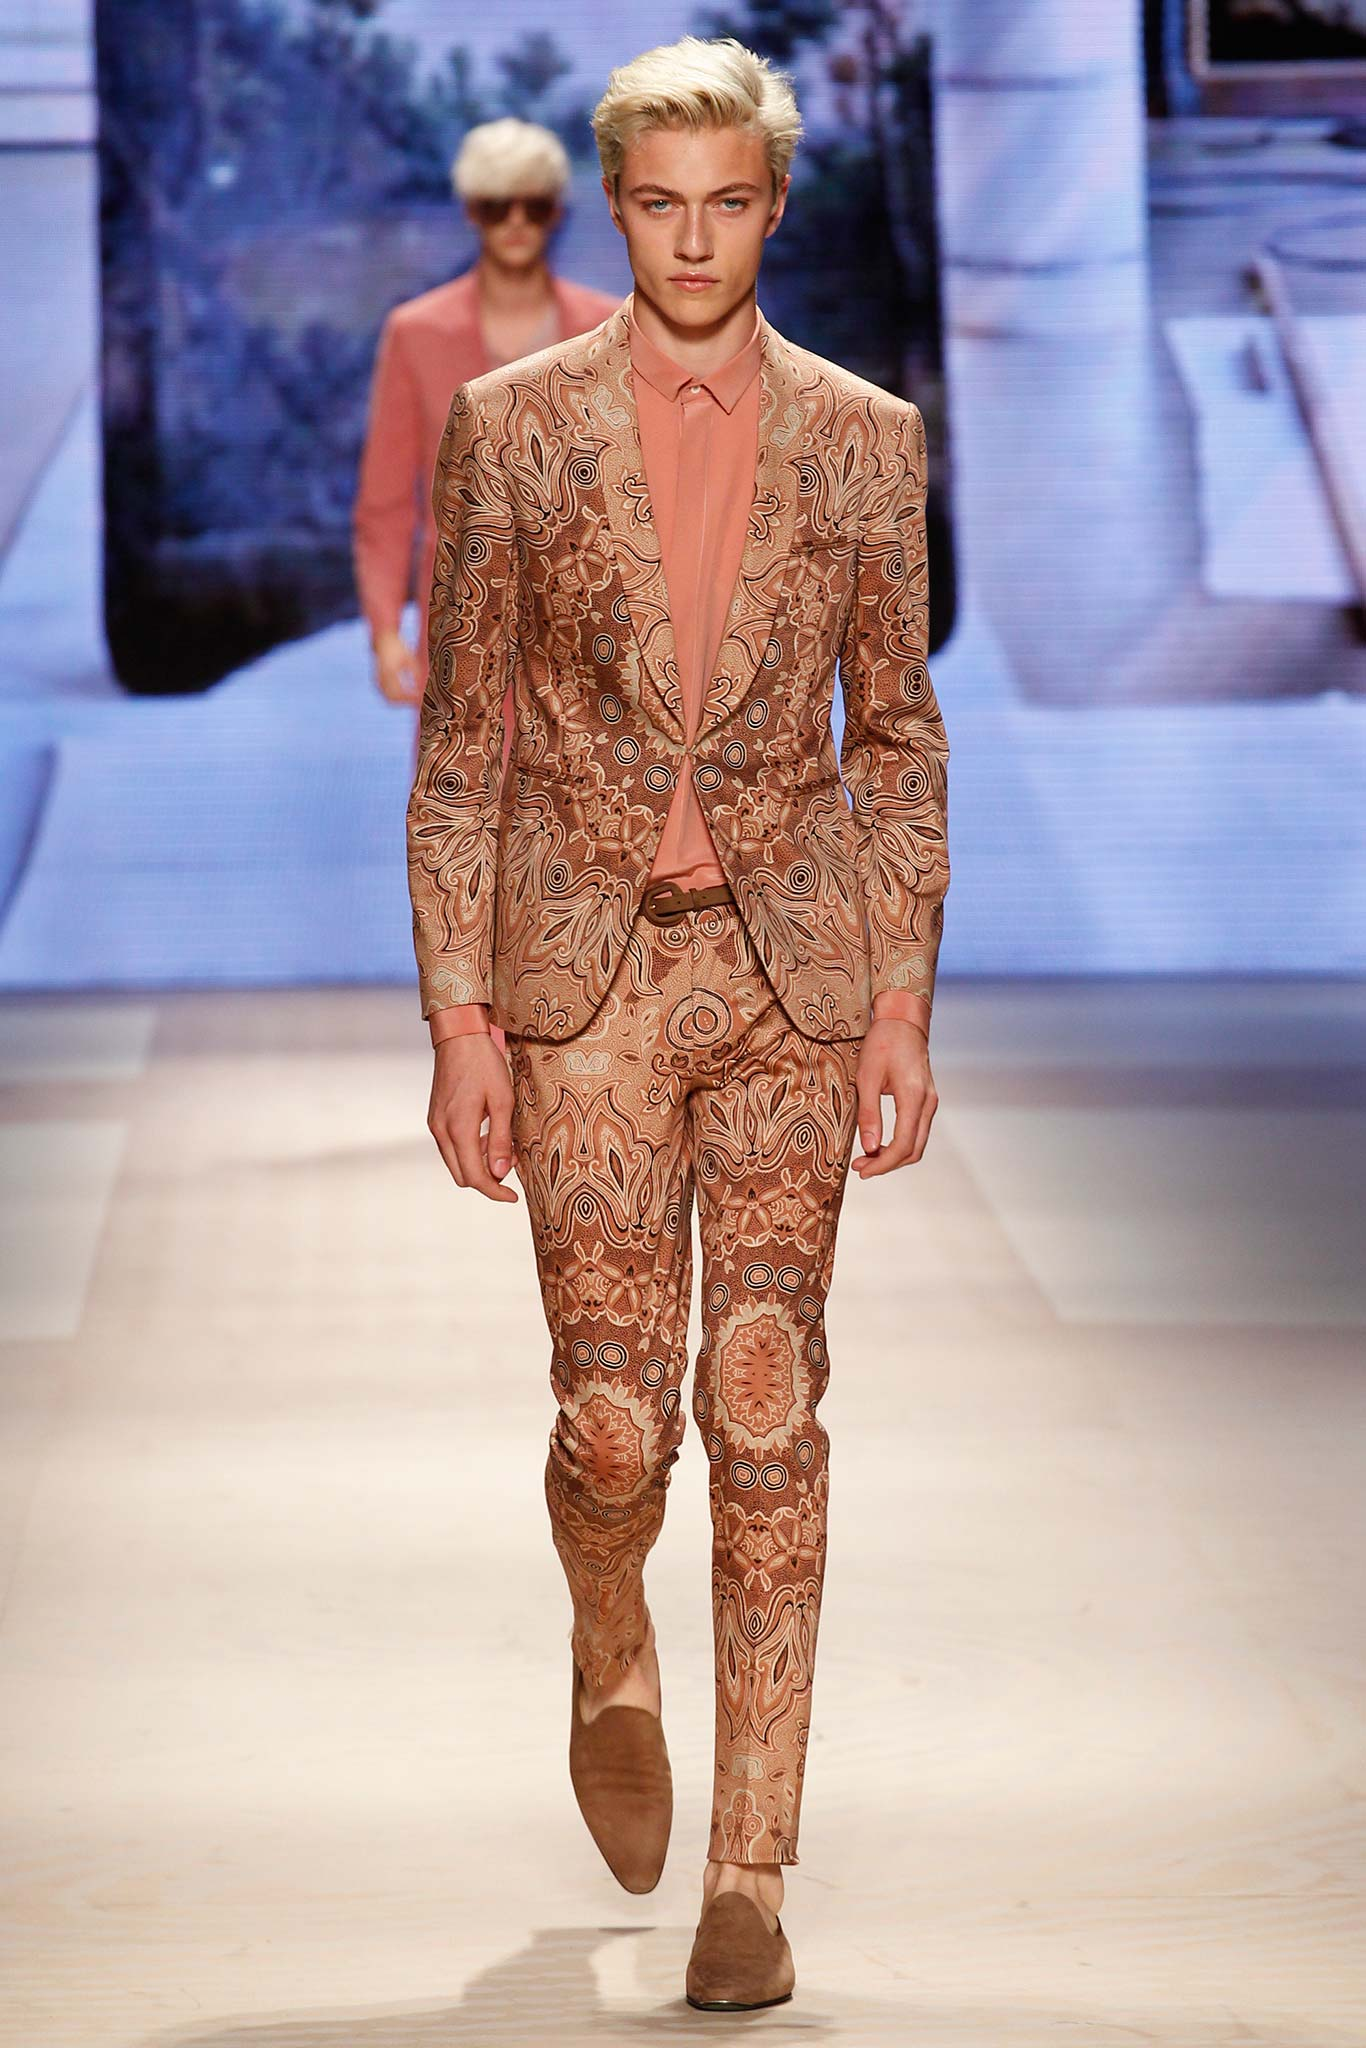 Etro Menswear SS 2016 Milan